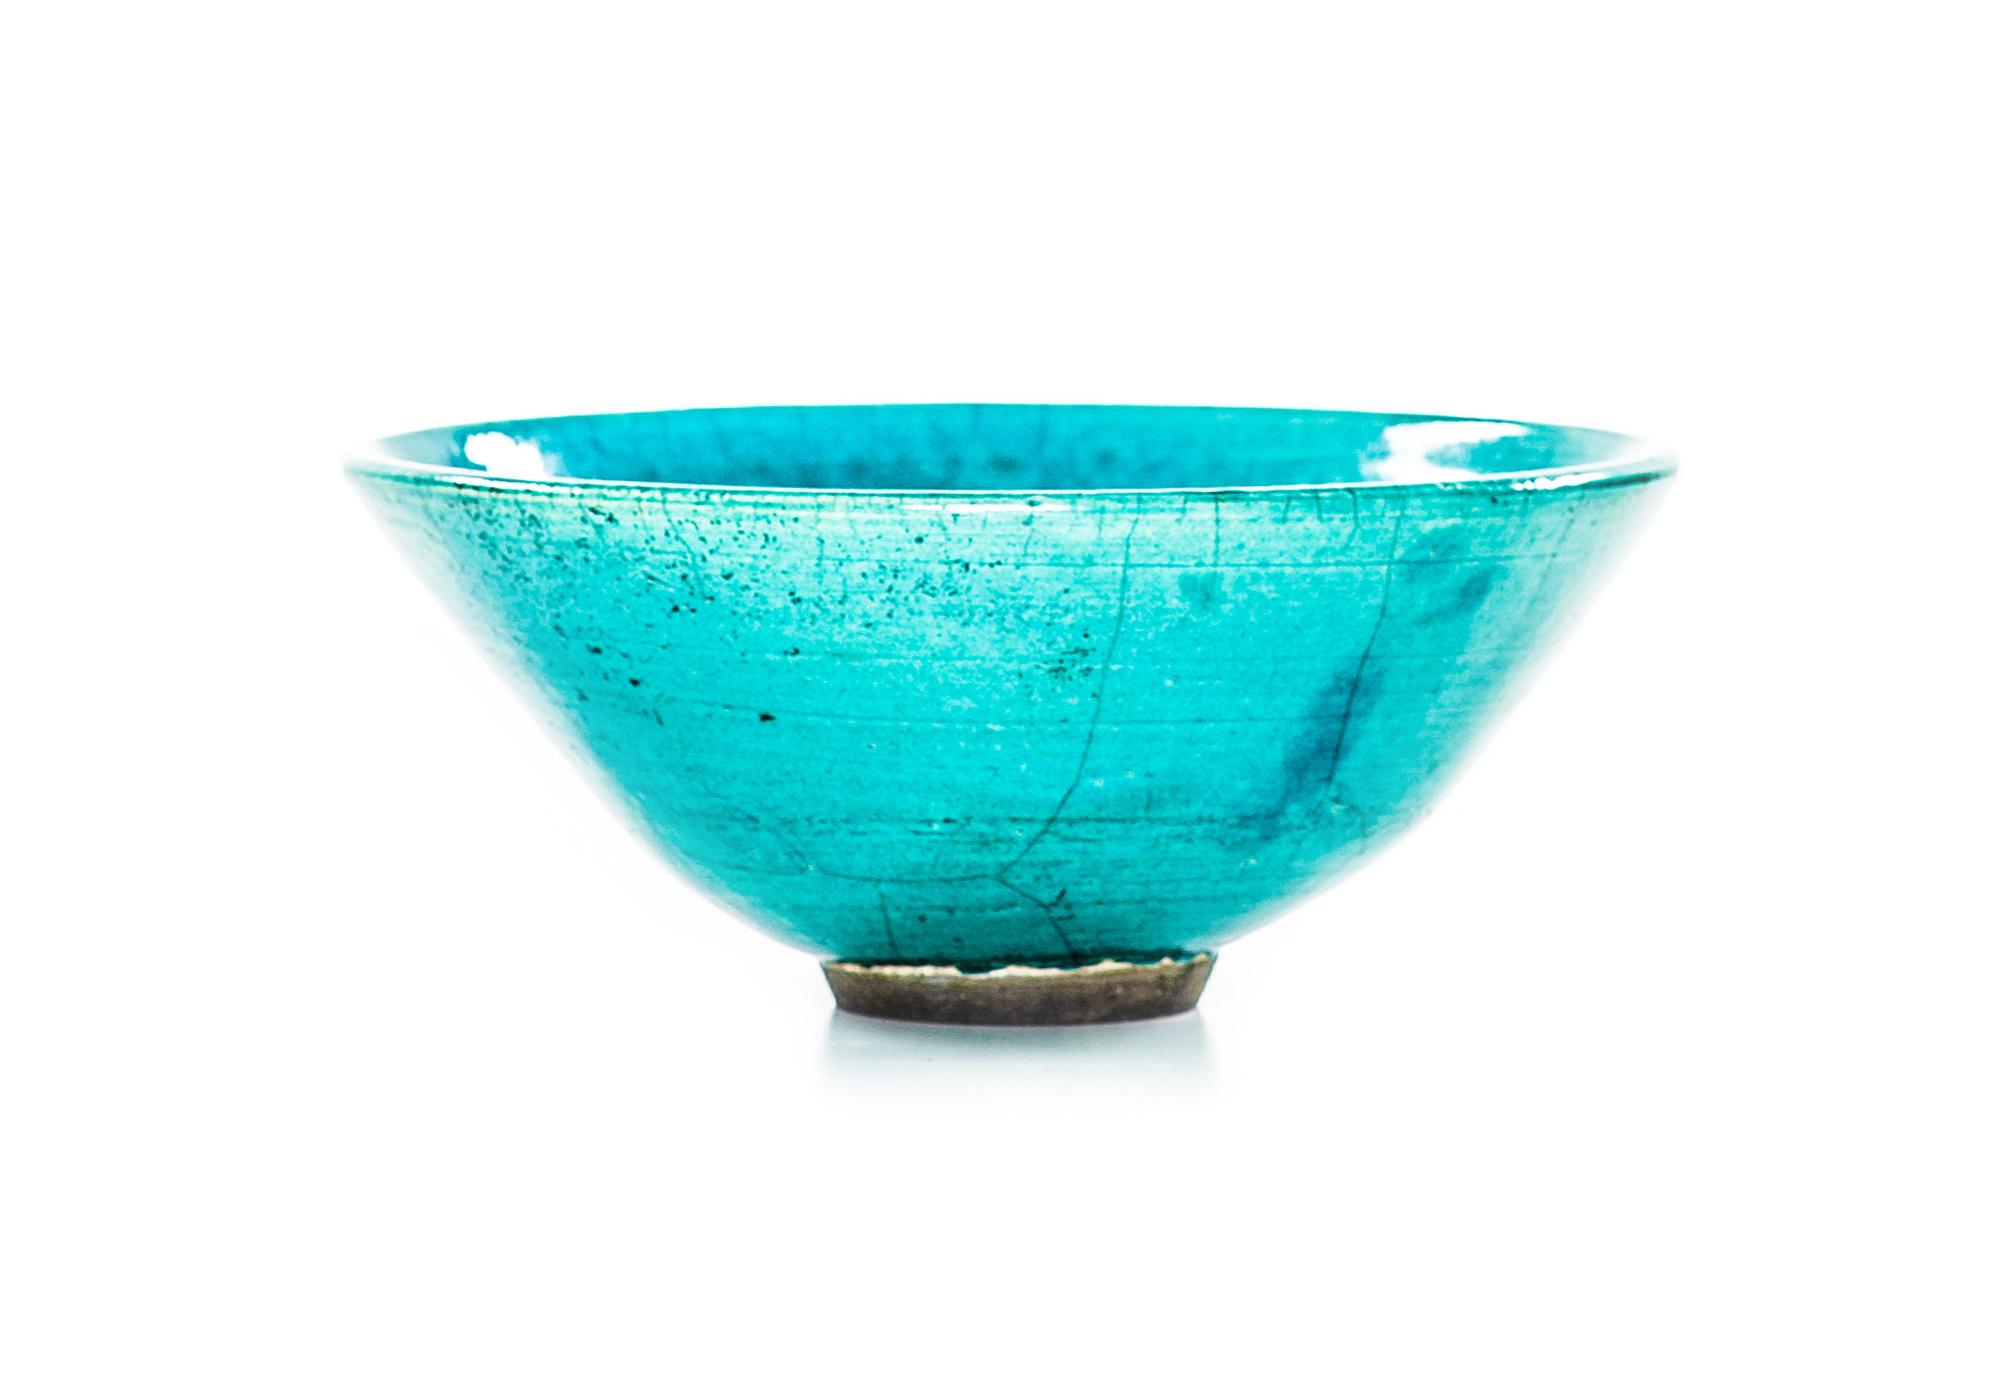 Turquoise raku bowl with copper